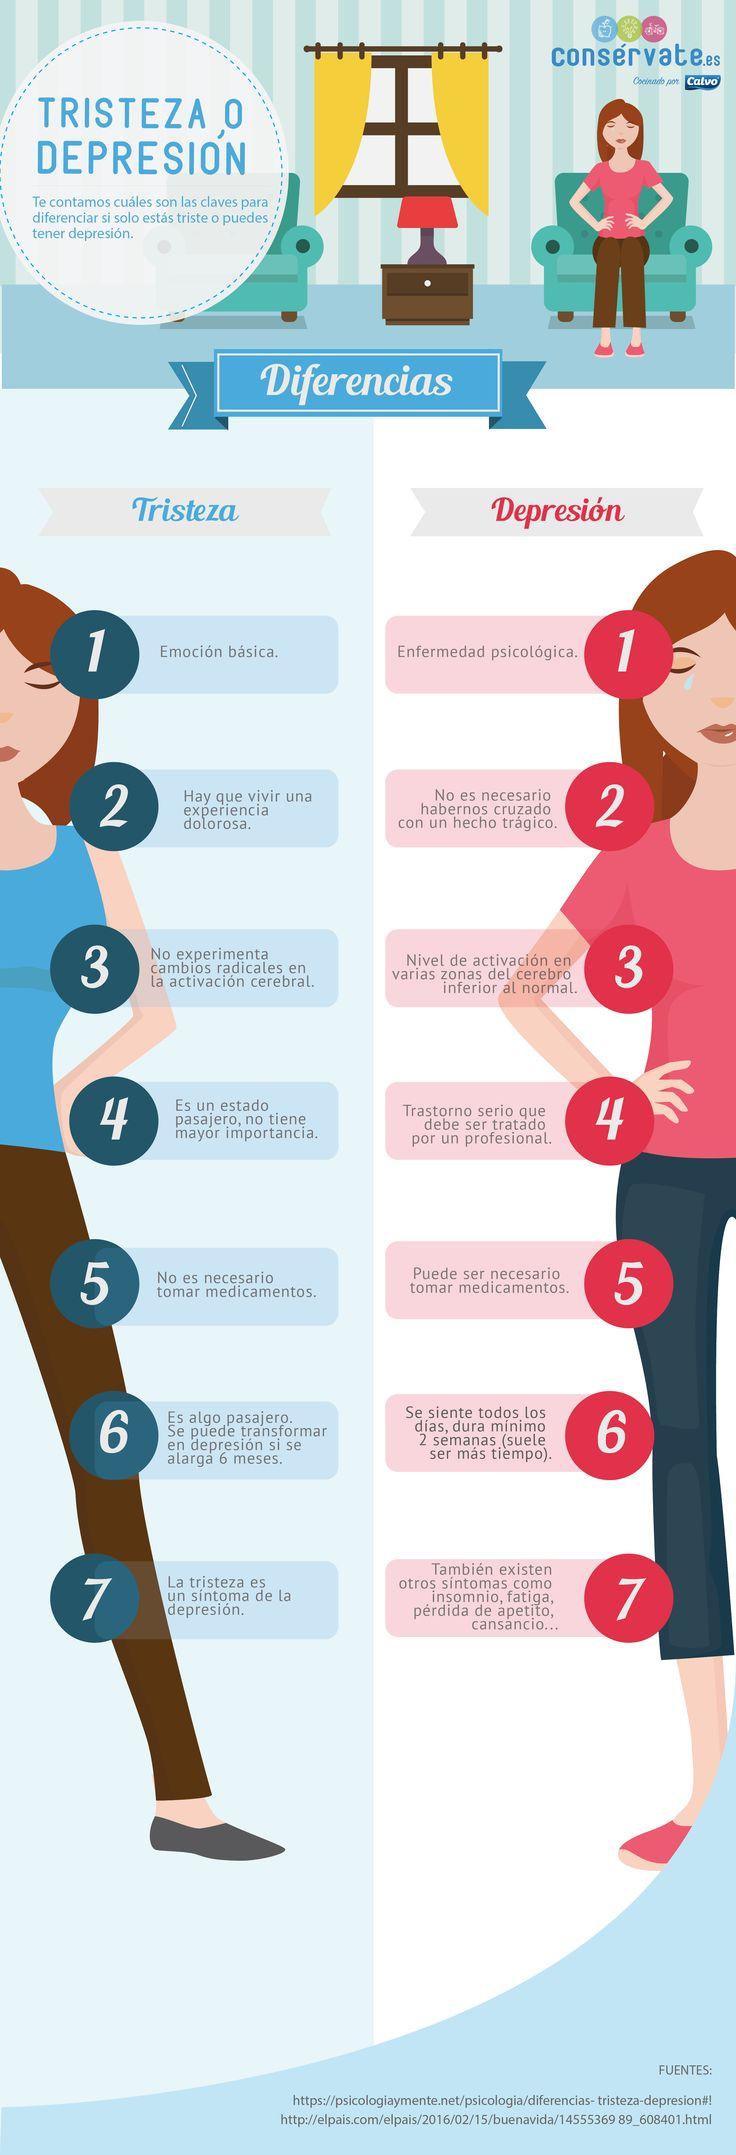 Tristeza o Depresión #infografia #infographic #health